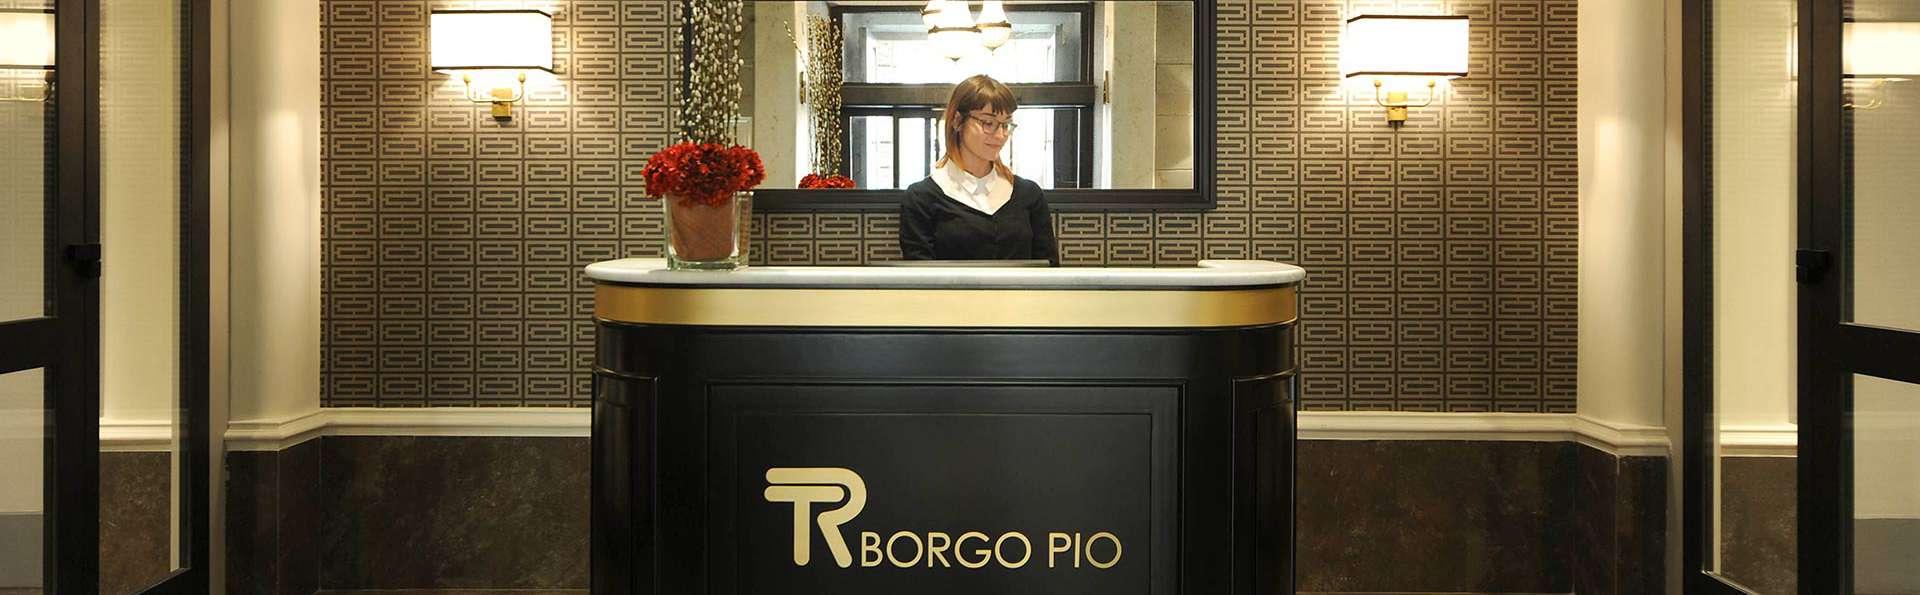 Trianon Borgo Pio - EDIT_LOBBY_01.jpg